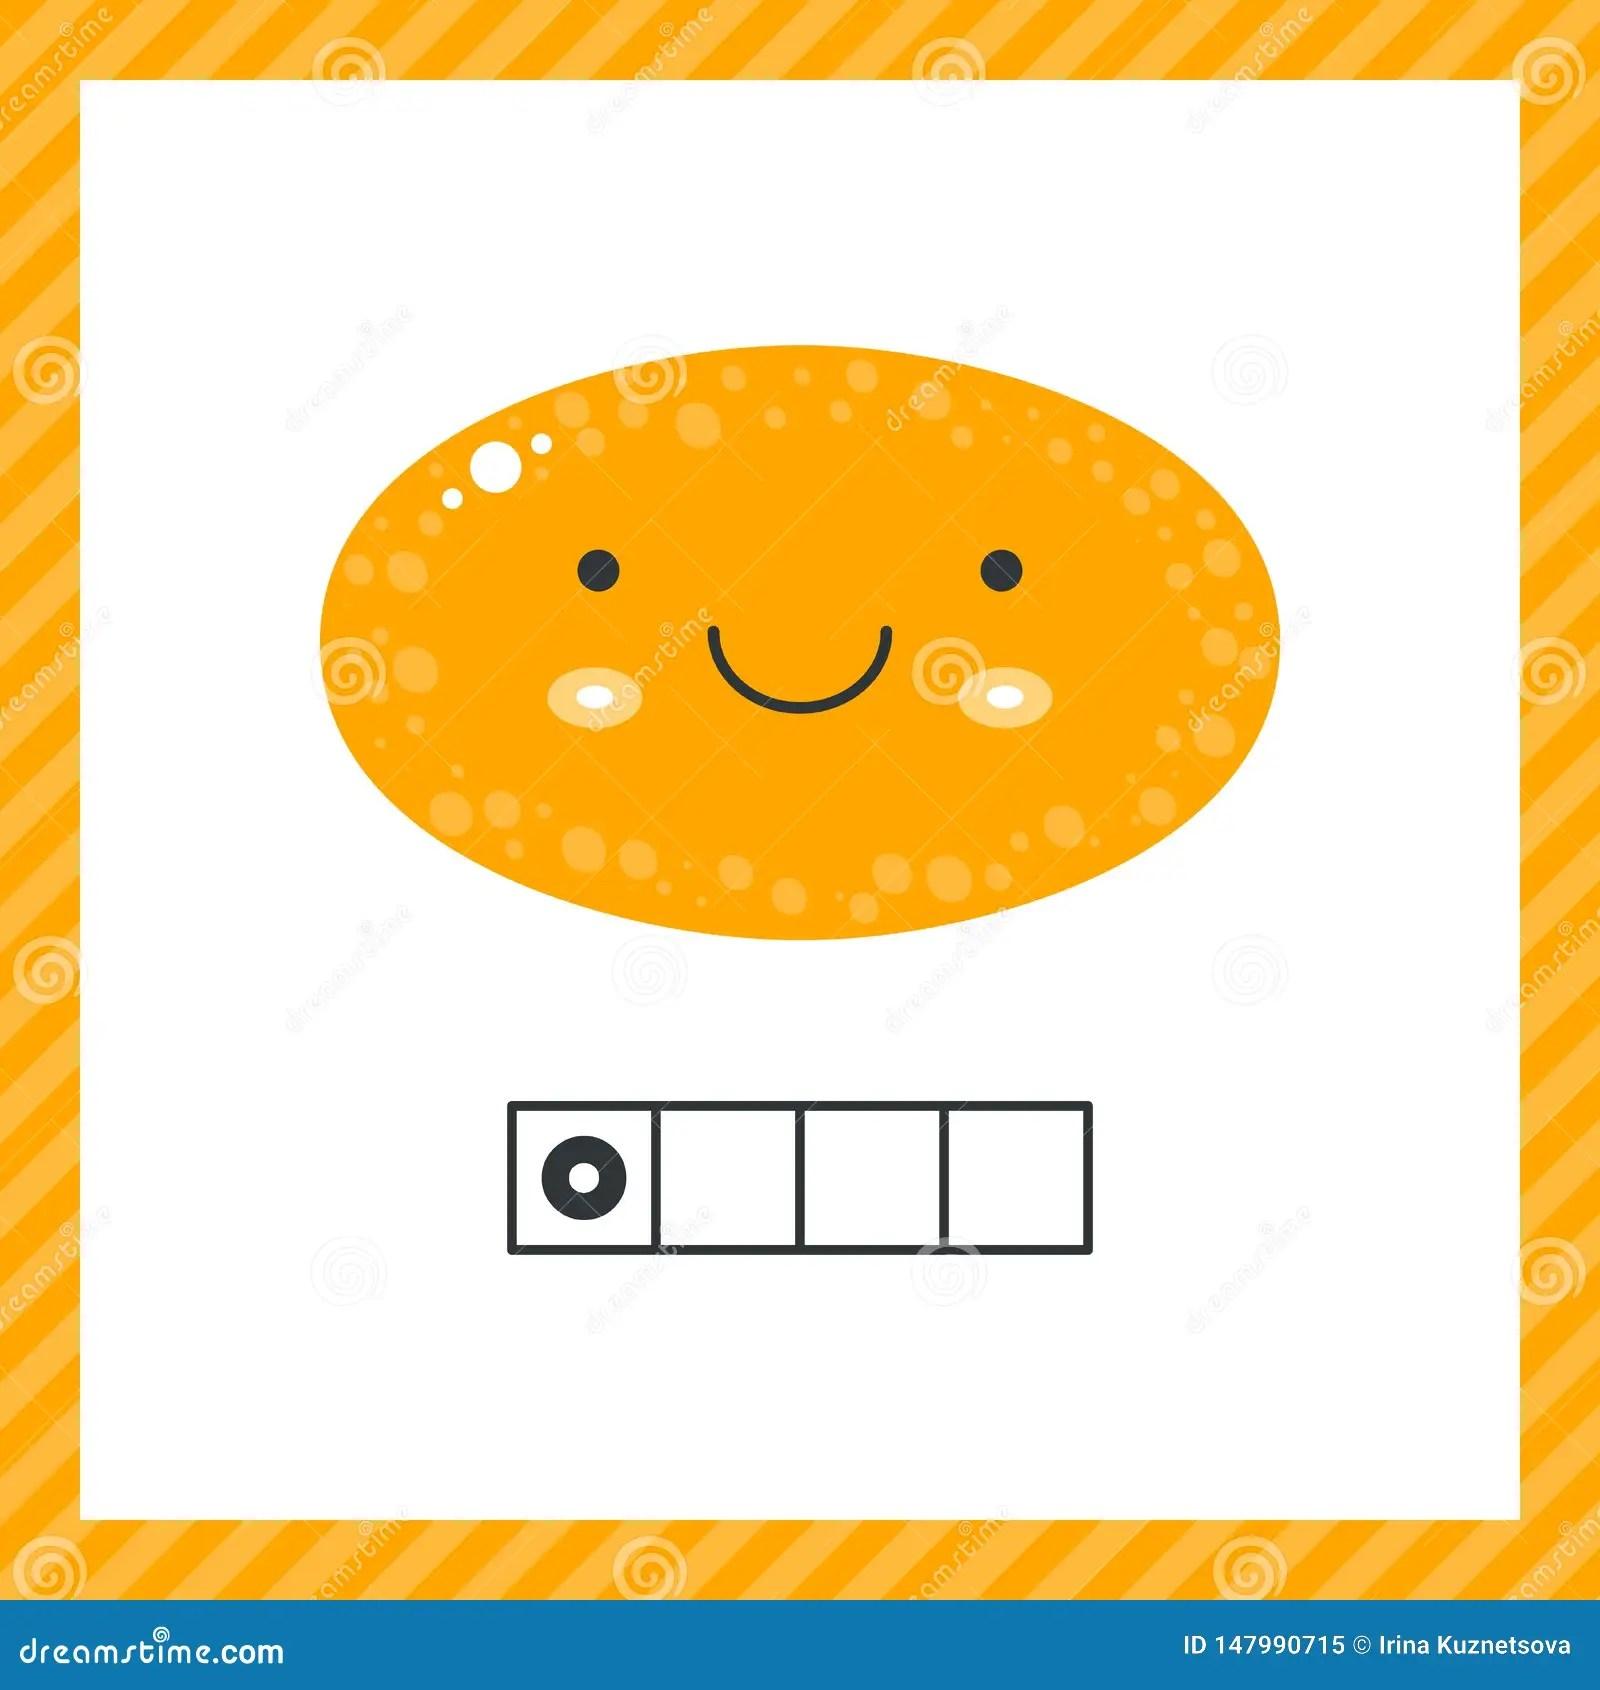 Cute Geometric Figures For Kids Orange Shape Oval